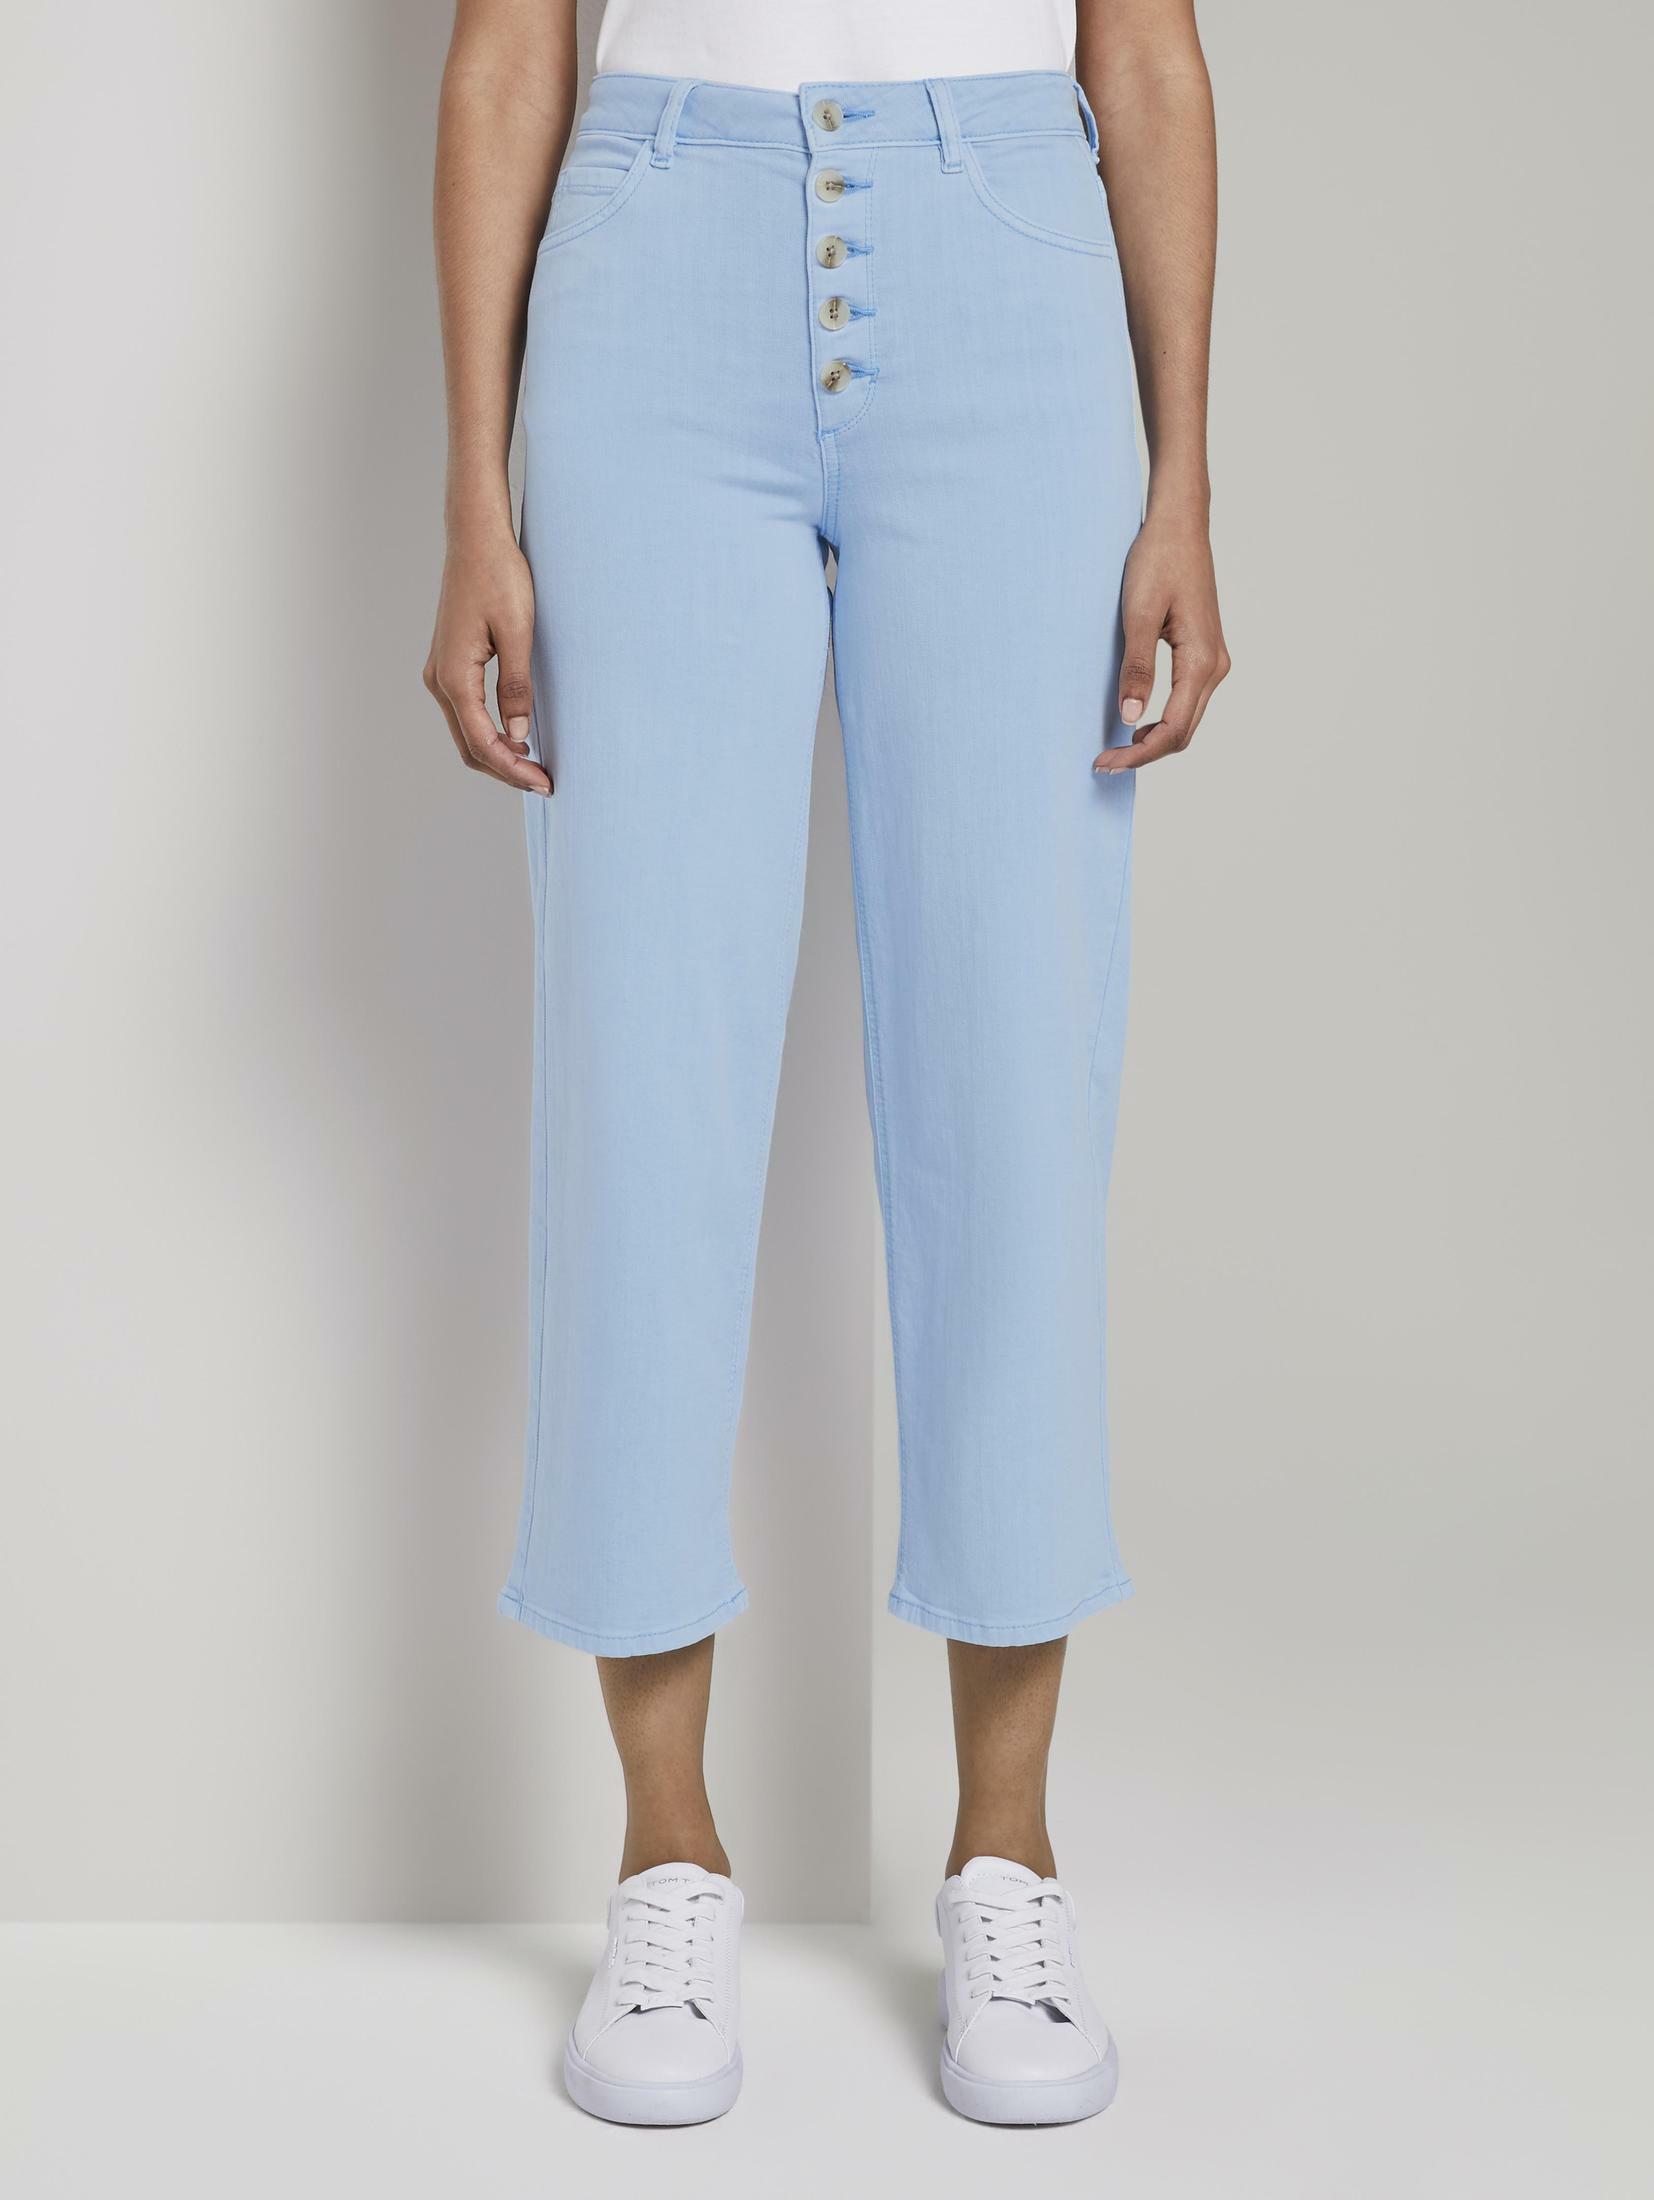 tom tailor mine to five -  Gerade Jeans Coloured Denim Culotte